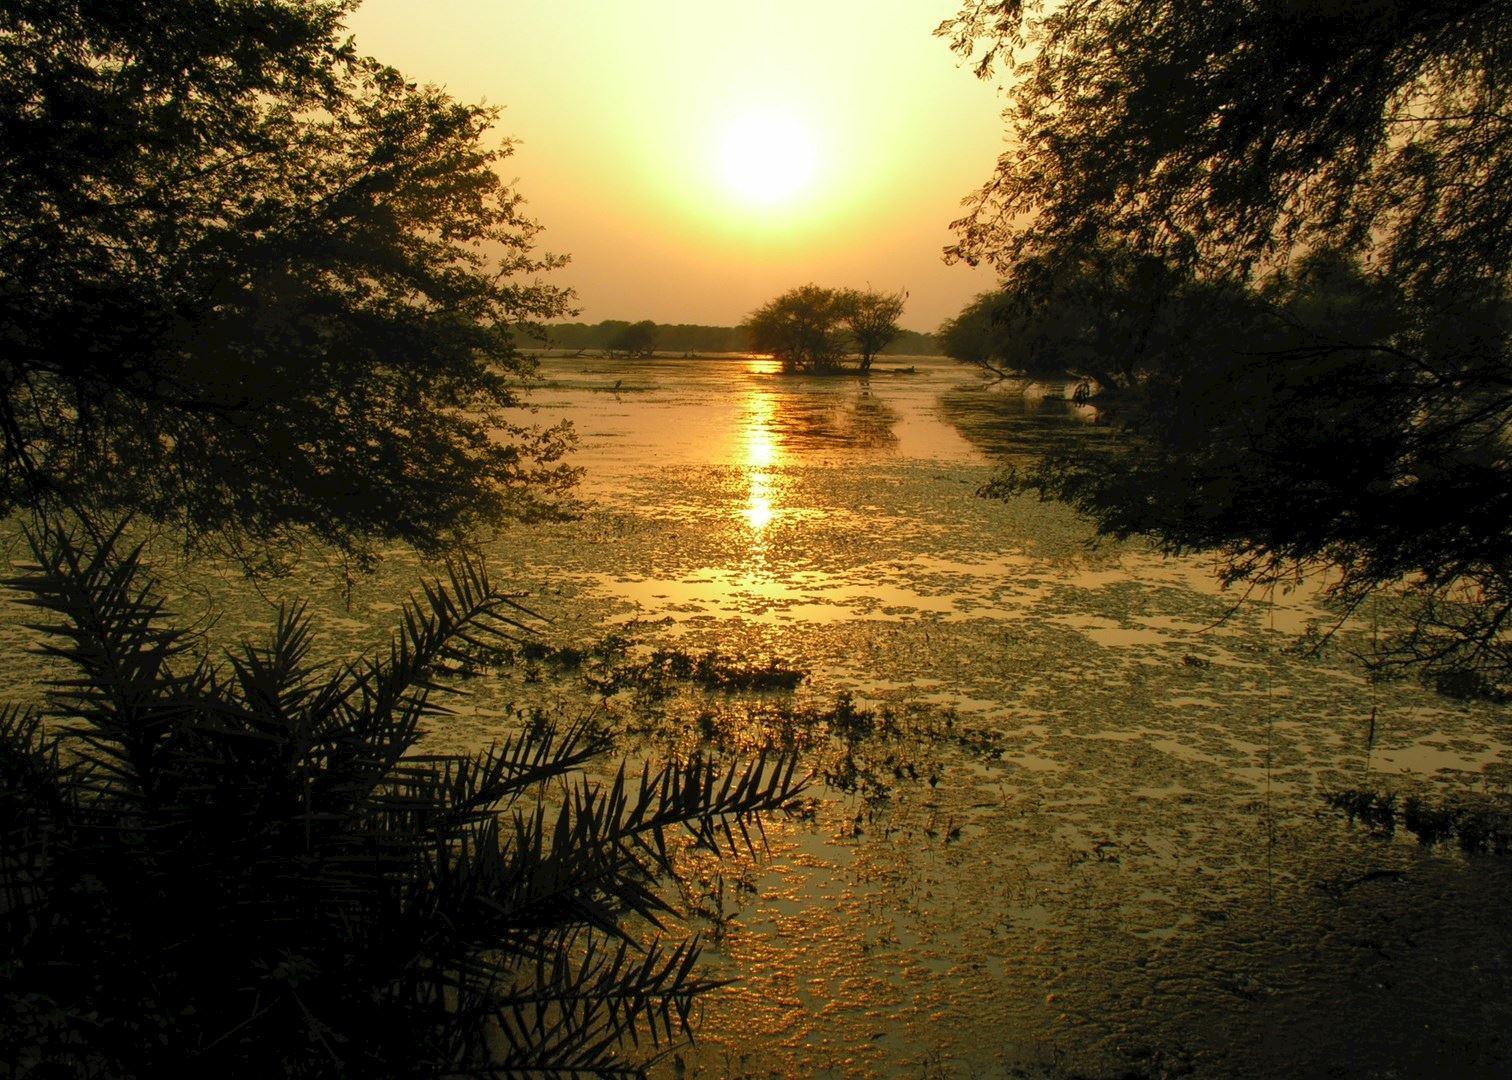 Bharatpur Amp Keoladeo Ghana National Park Audley Travel